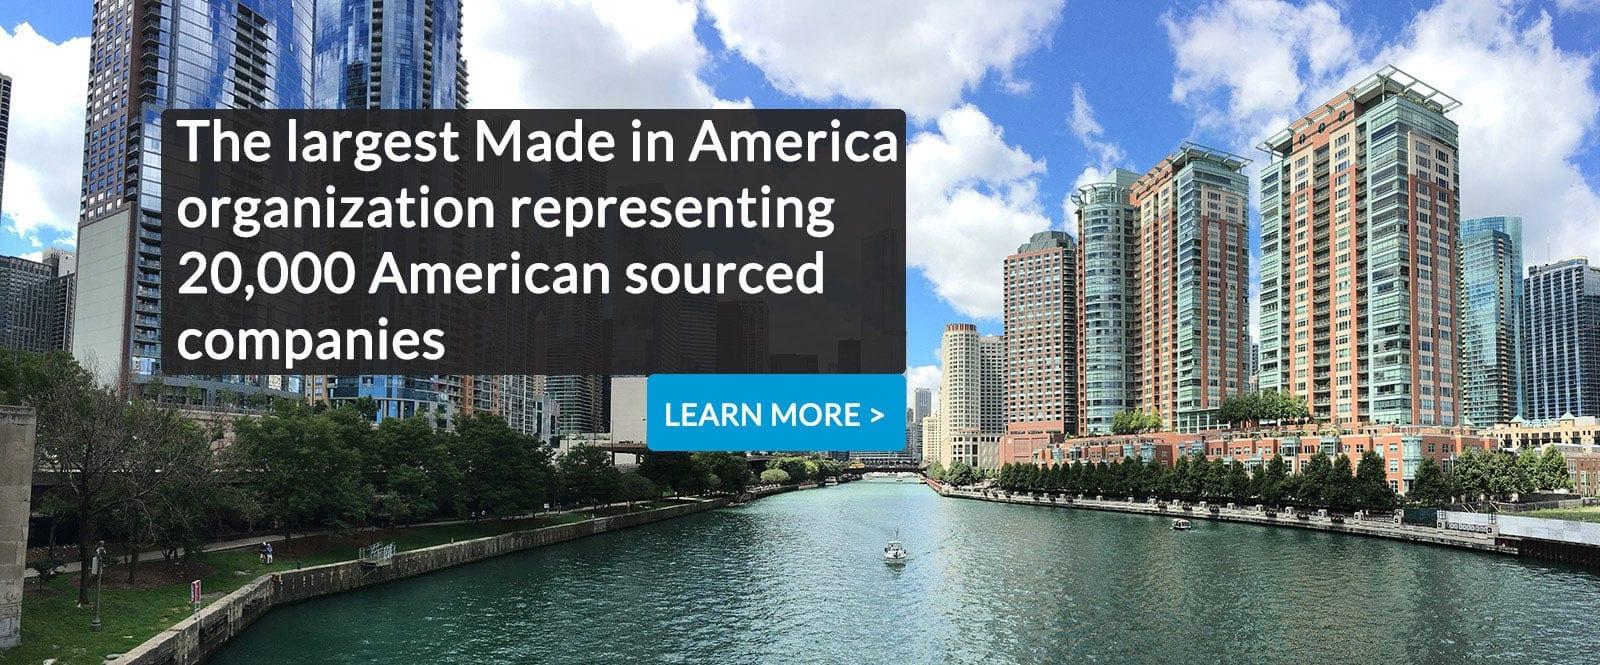 chciago waterway - Busineses in America